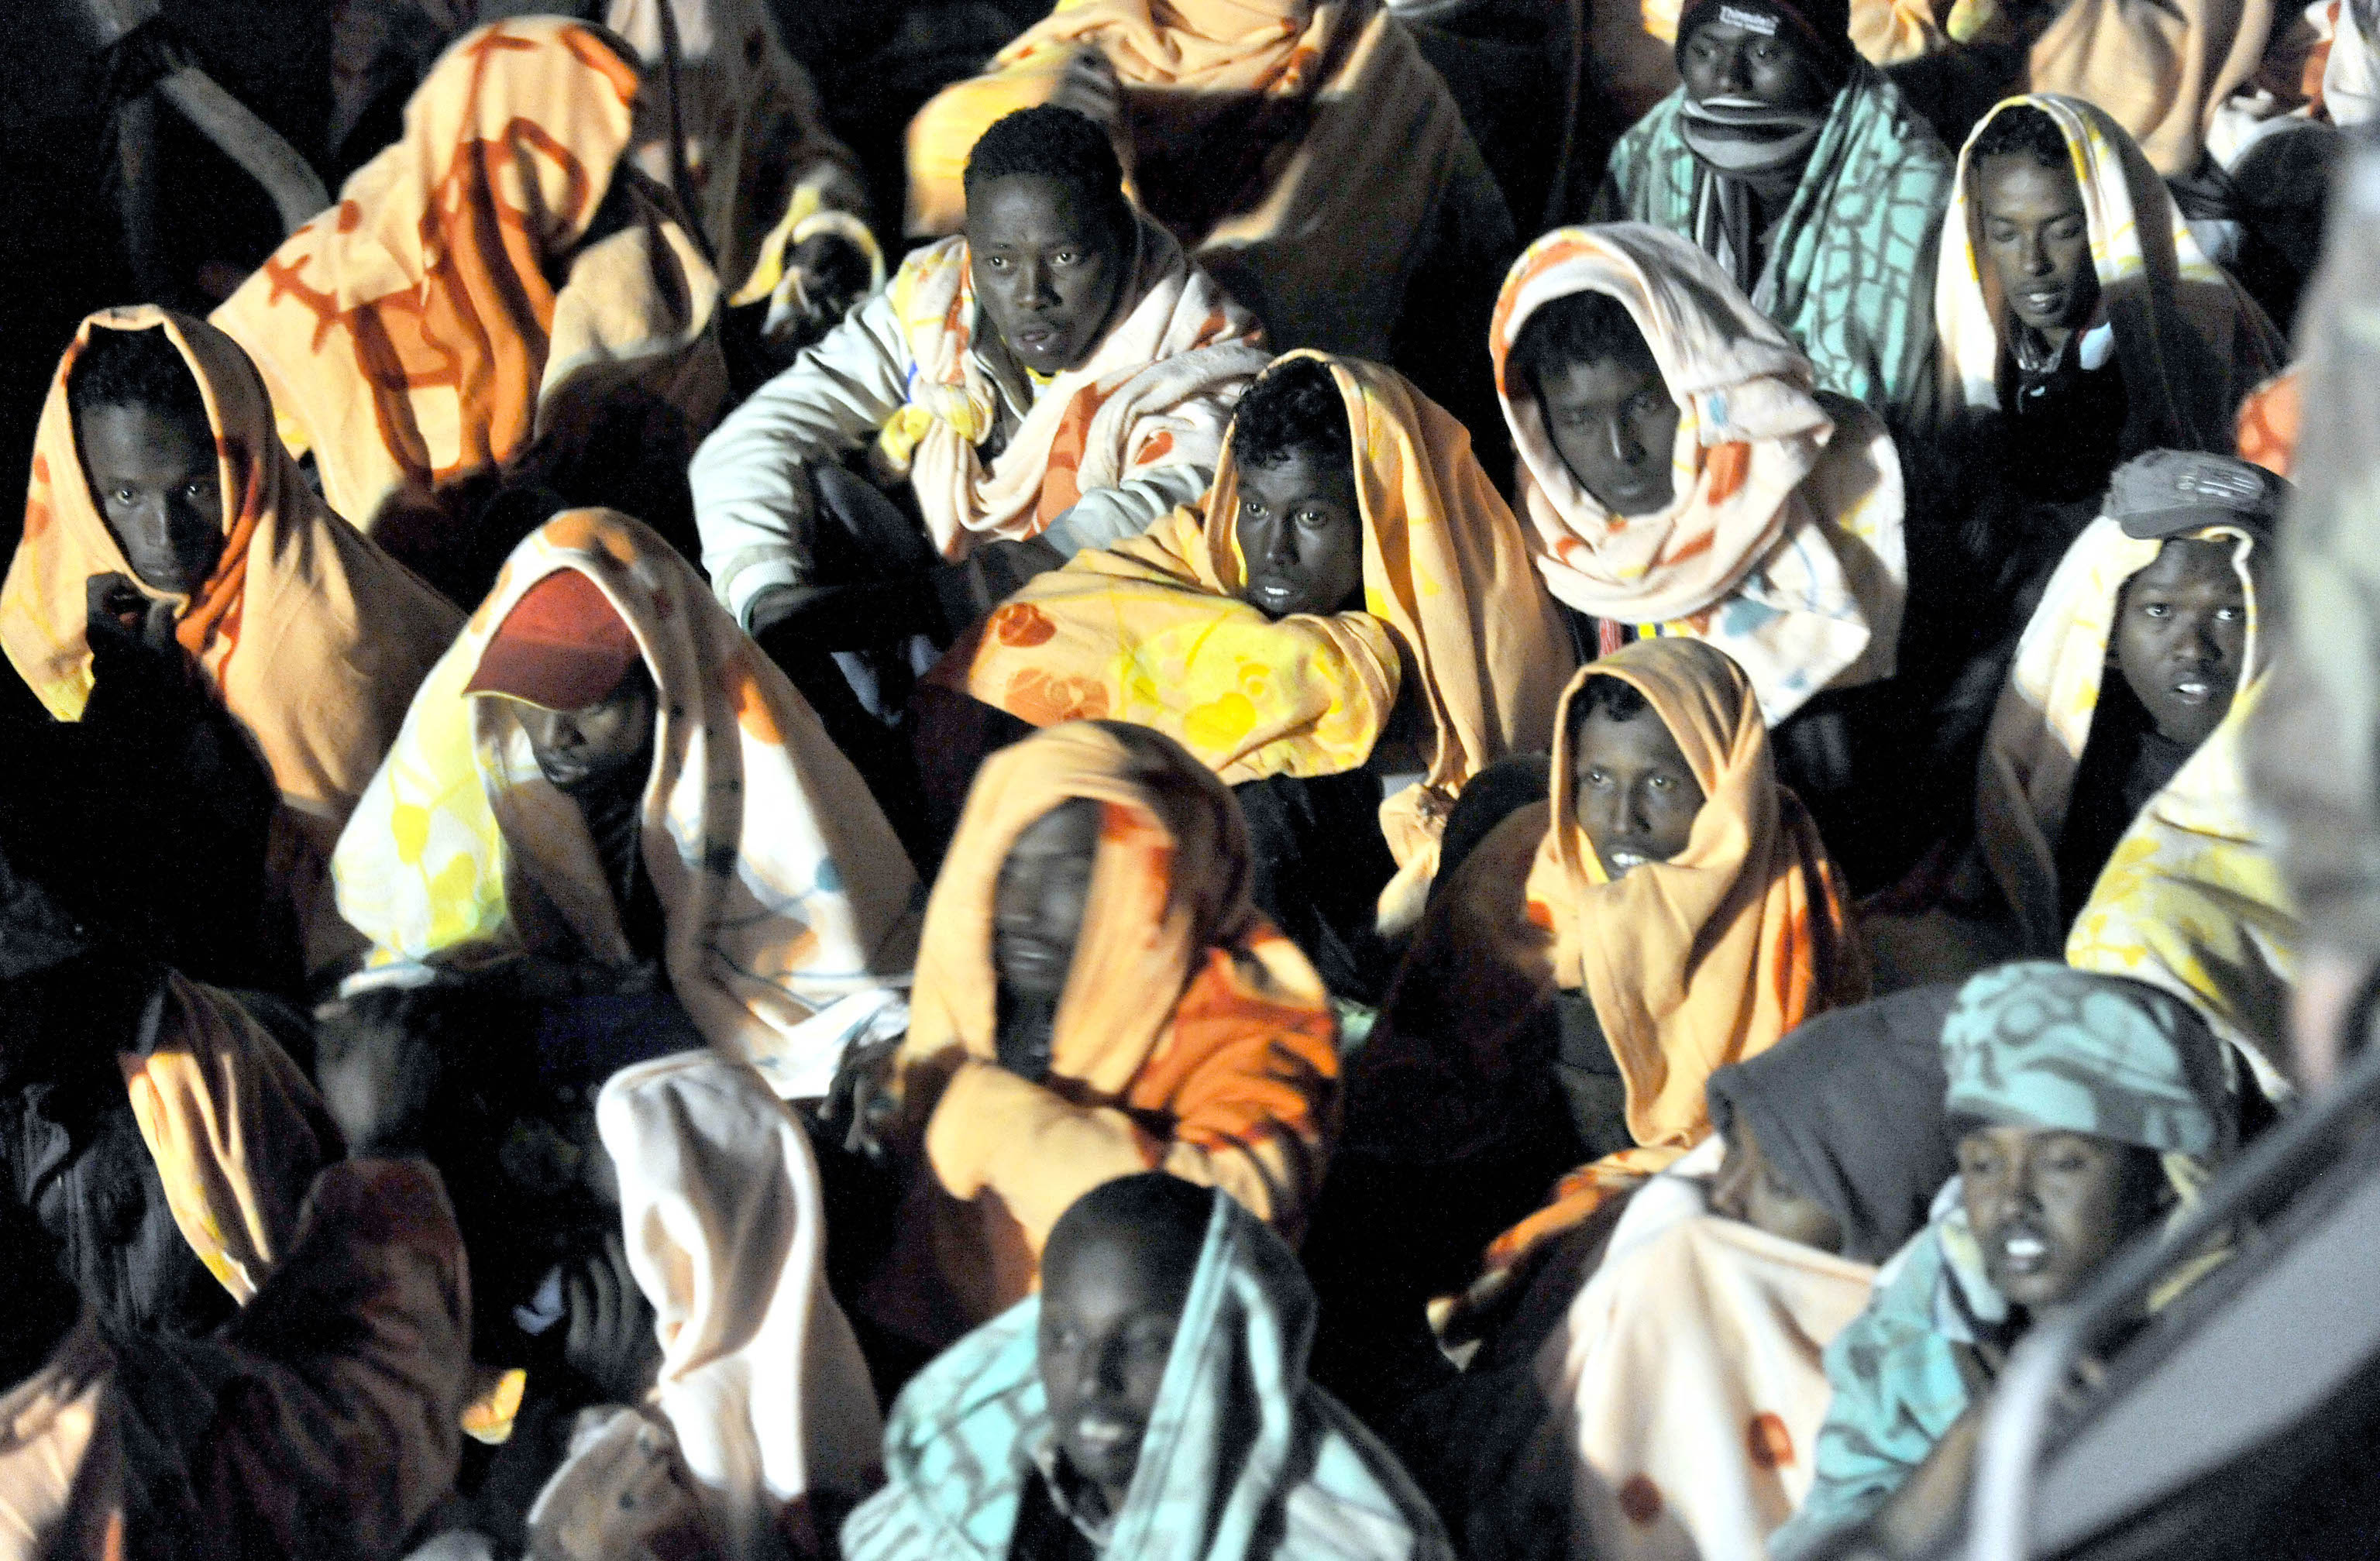 I migranti soccorsi a Lampedusa